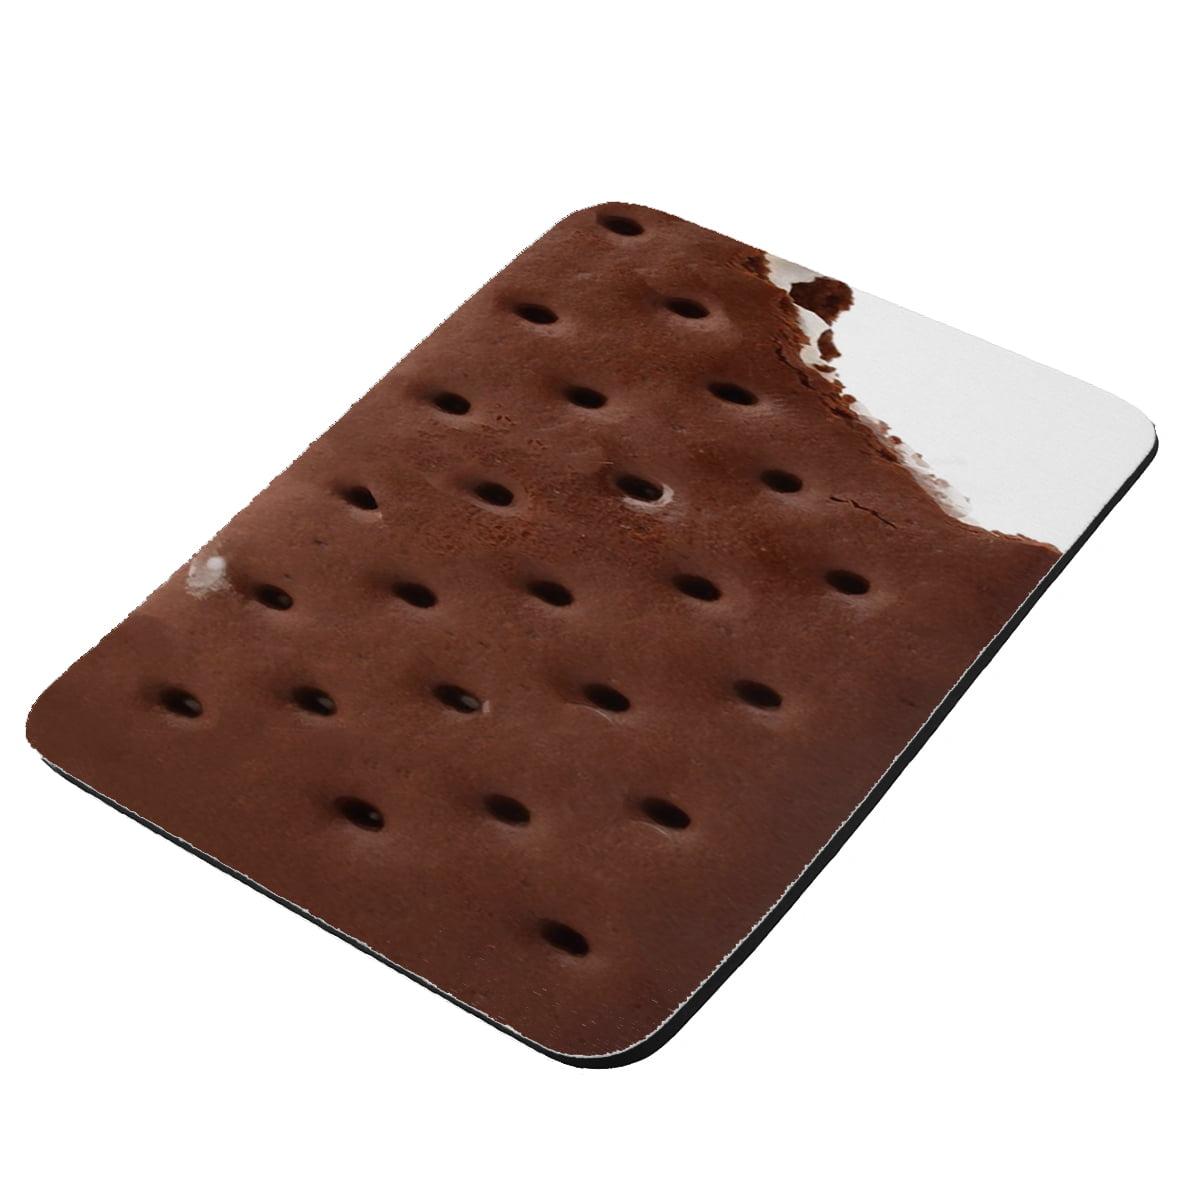 Ice Cream Sandwich - KuzmarK Mousepad / Hot Pad / Trivet